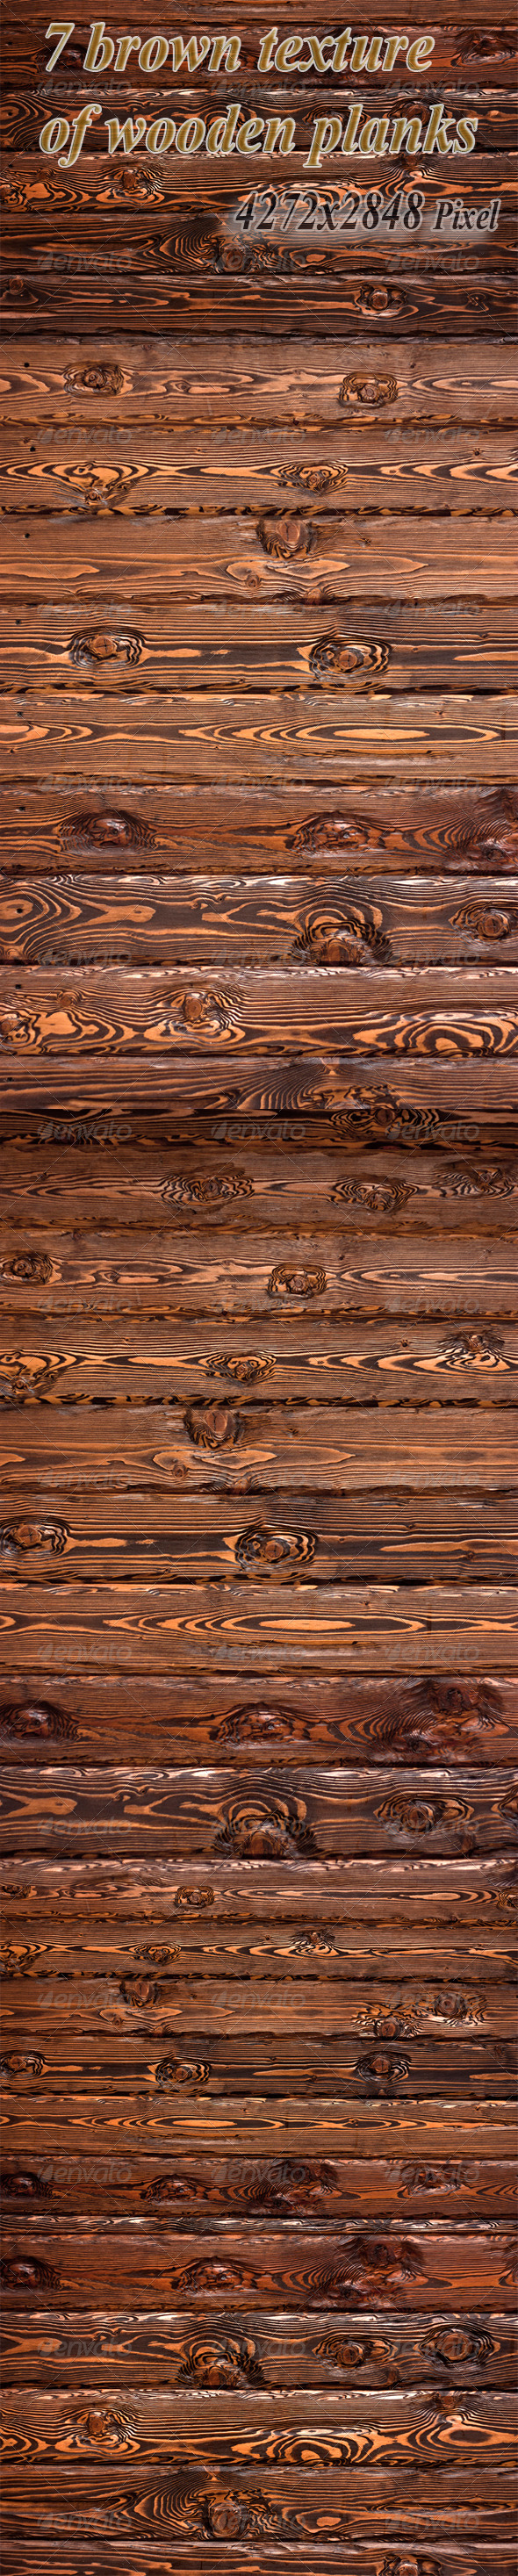 Seven Brown Texture of Wooden Planks - Wood Textures